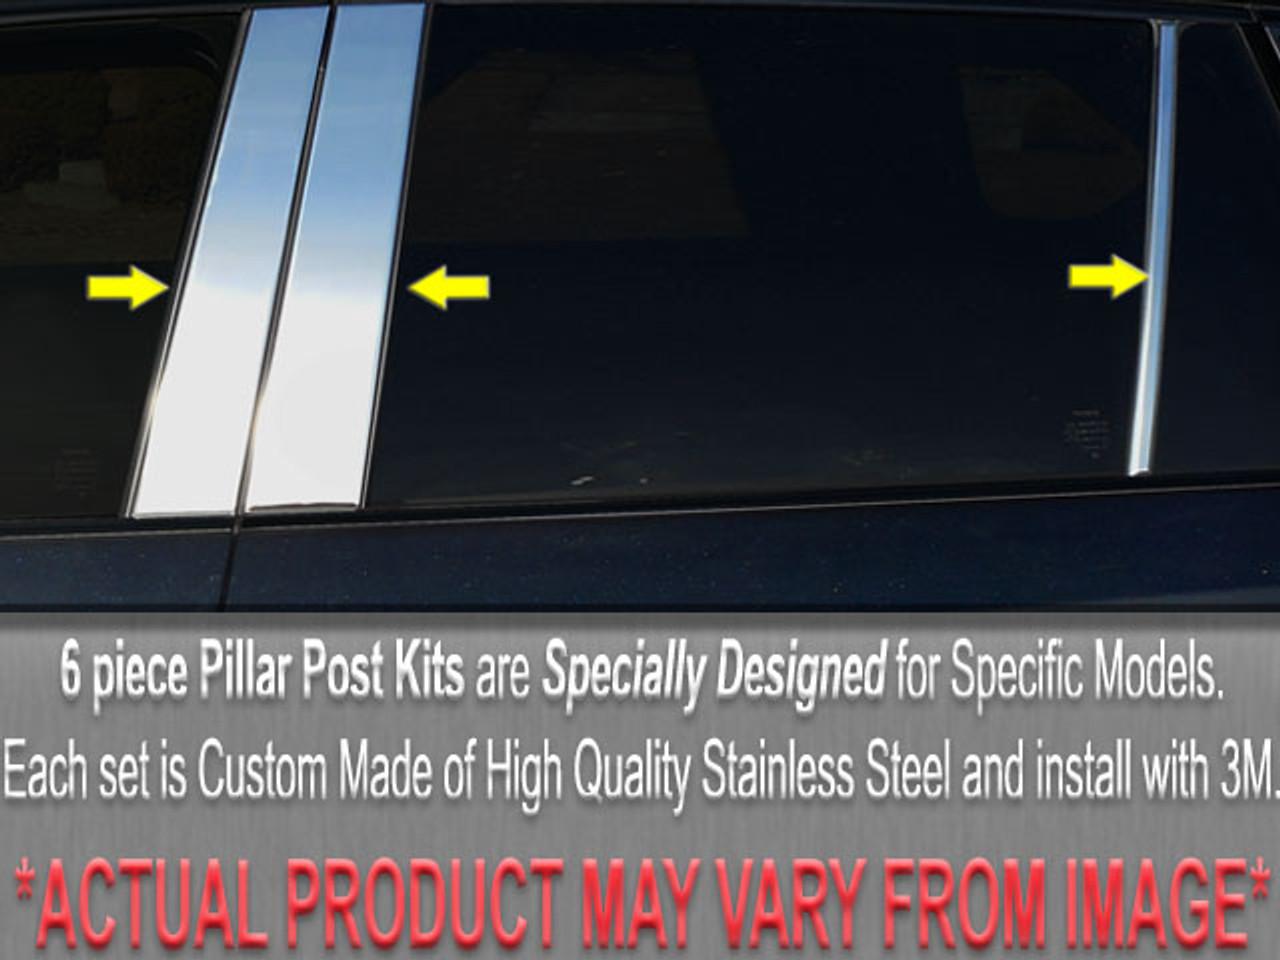 PP21770 For MAZDA MILLENIA 1995-2002 4PC Stainless Steel Pillar Post Trim